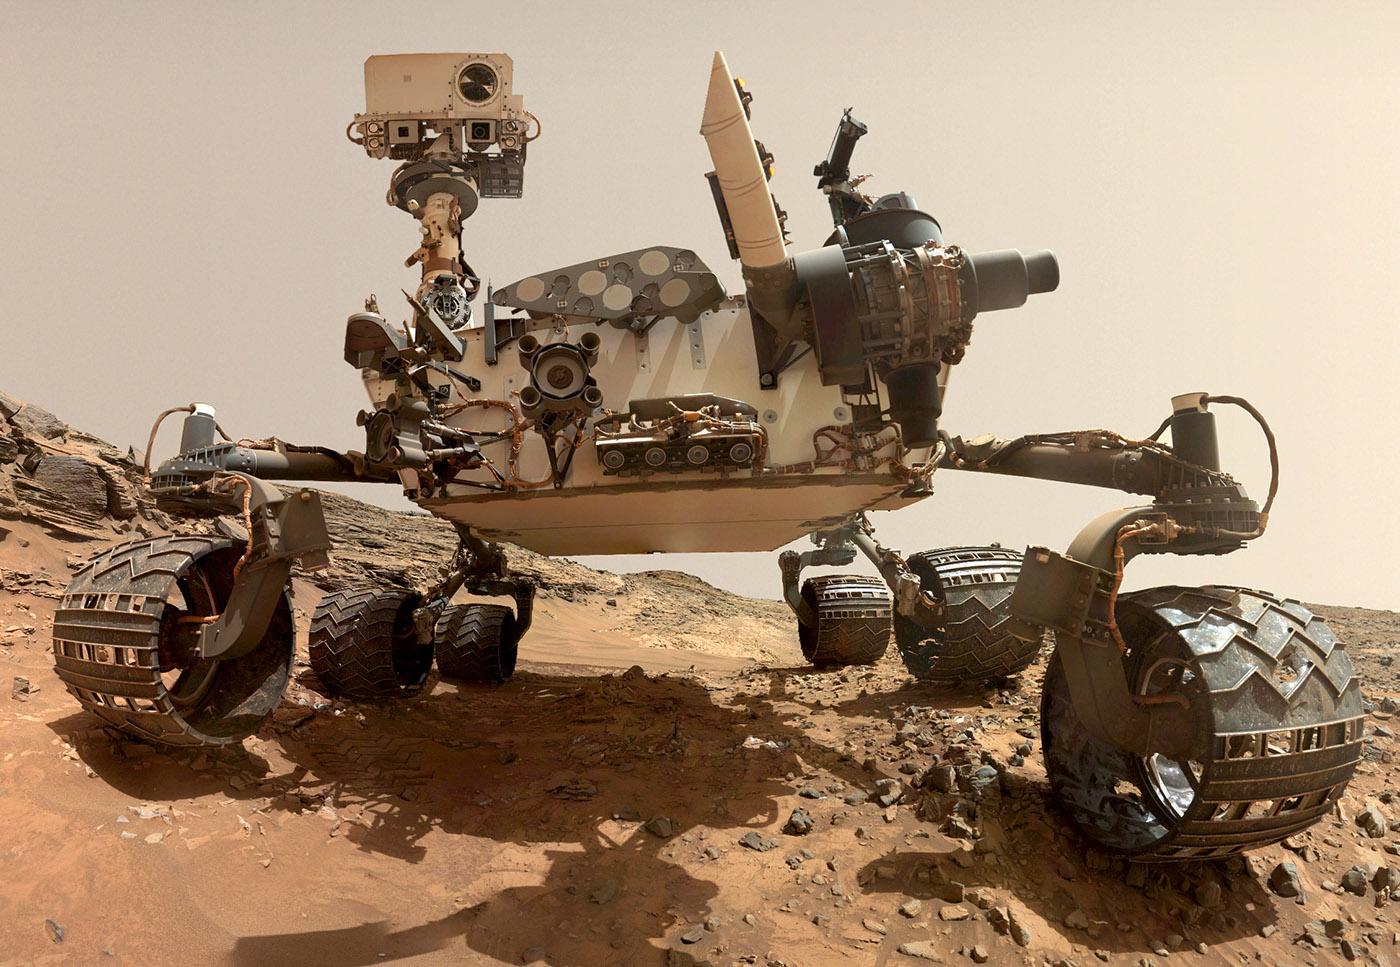 Curiosity rover portrait wide